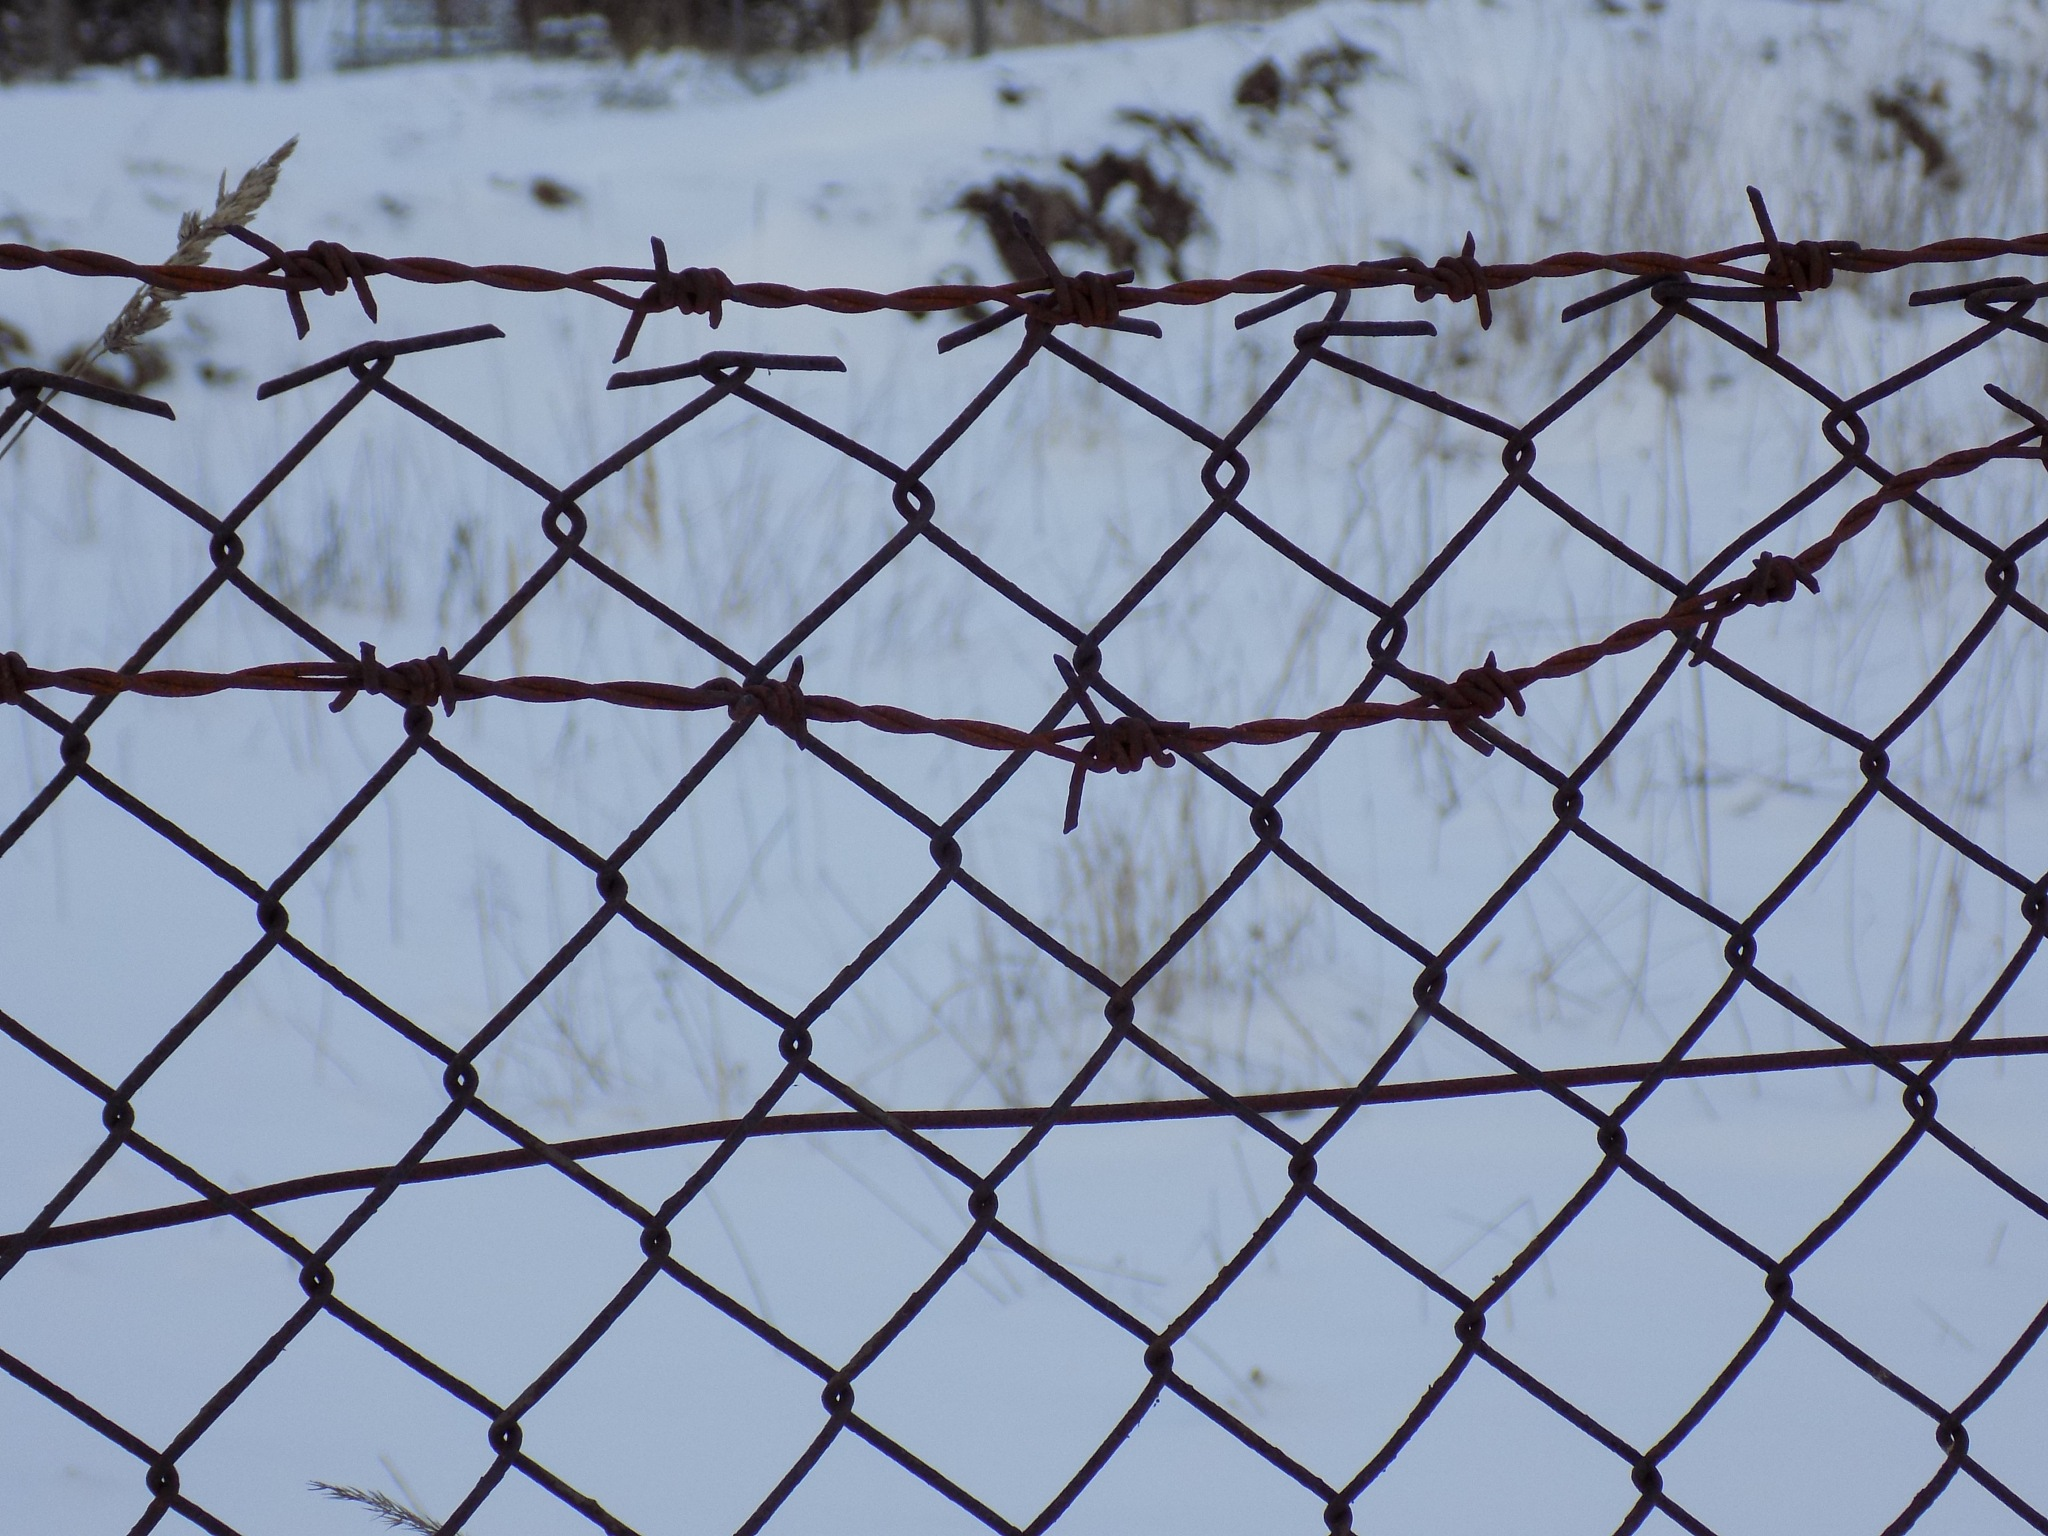 Fence by uzkuraitiene62